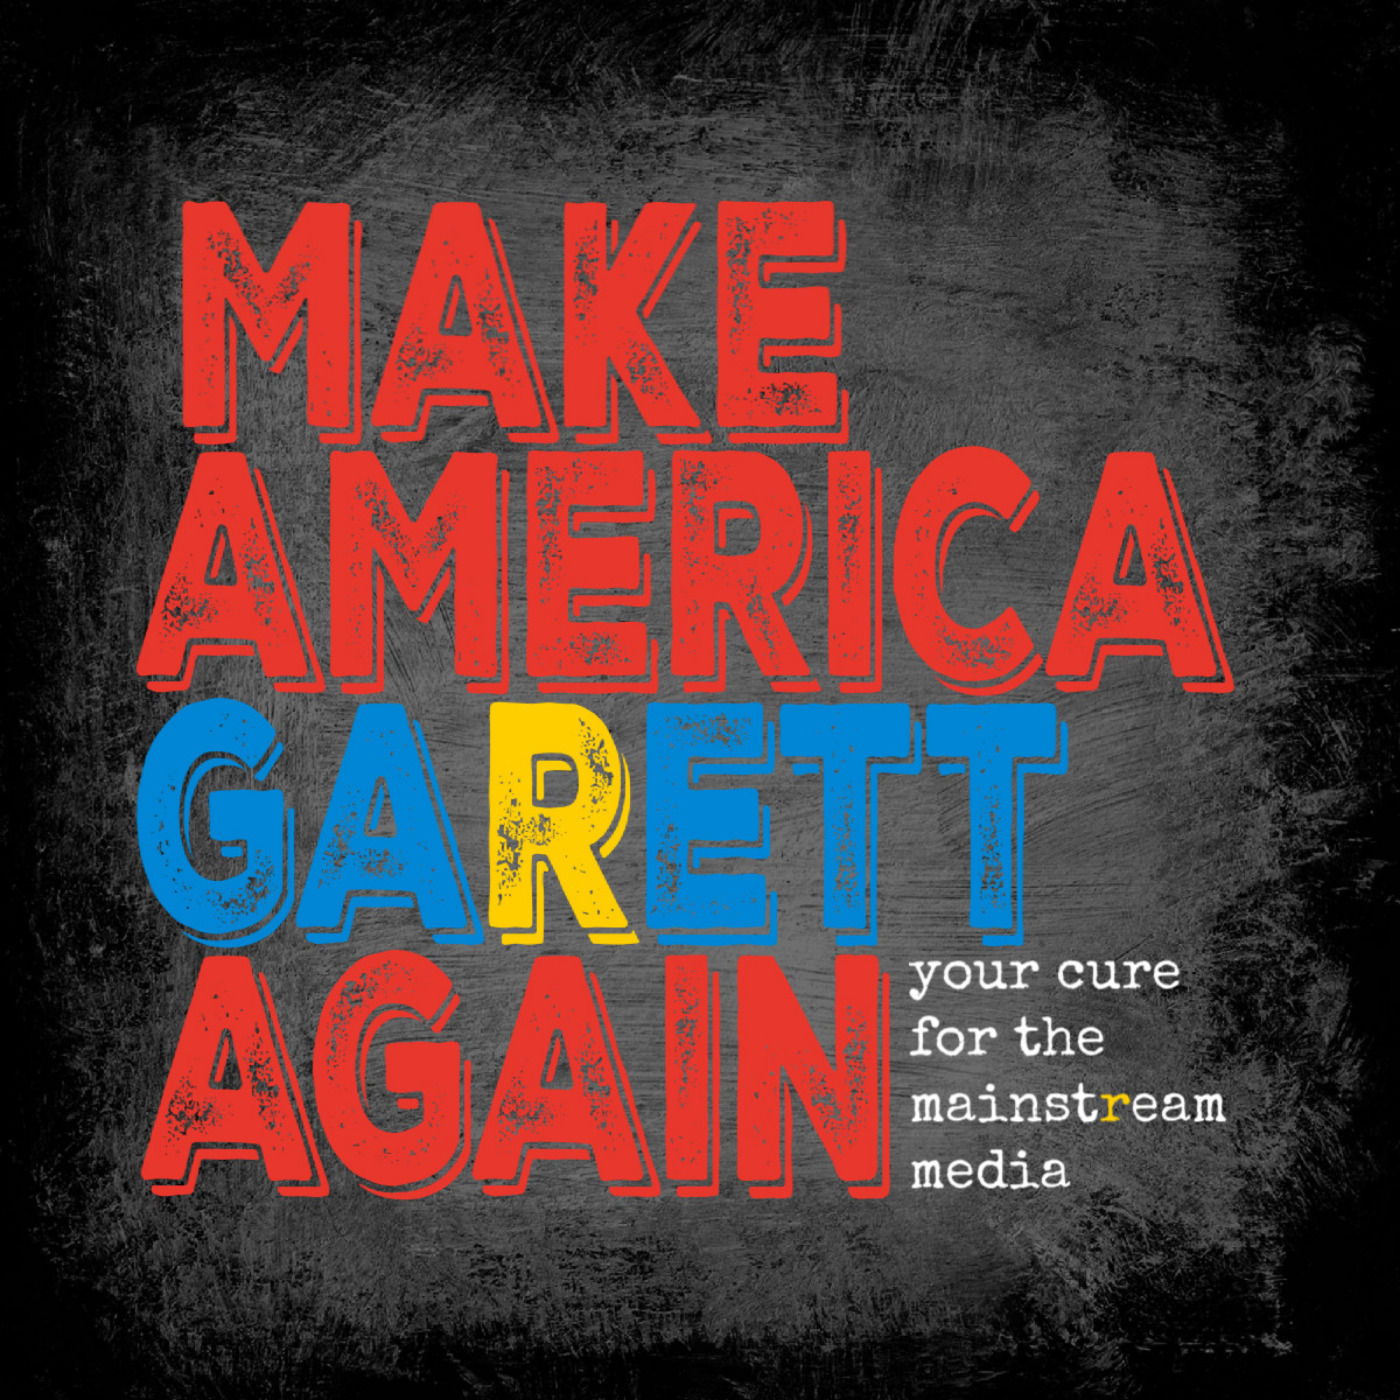 Make America Garett Again